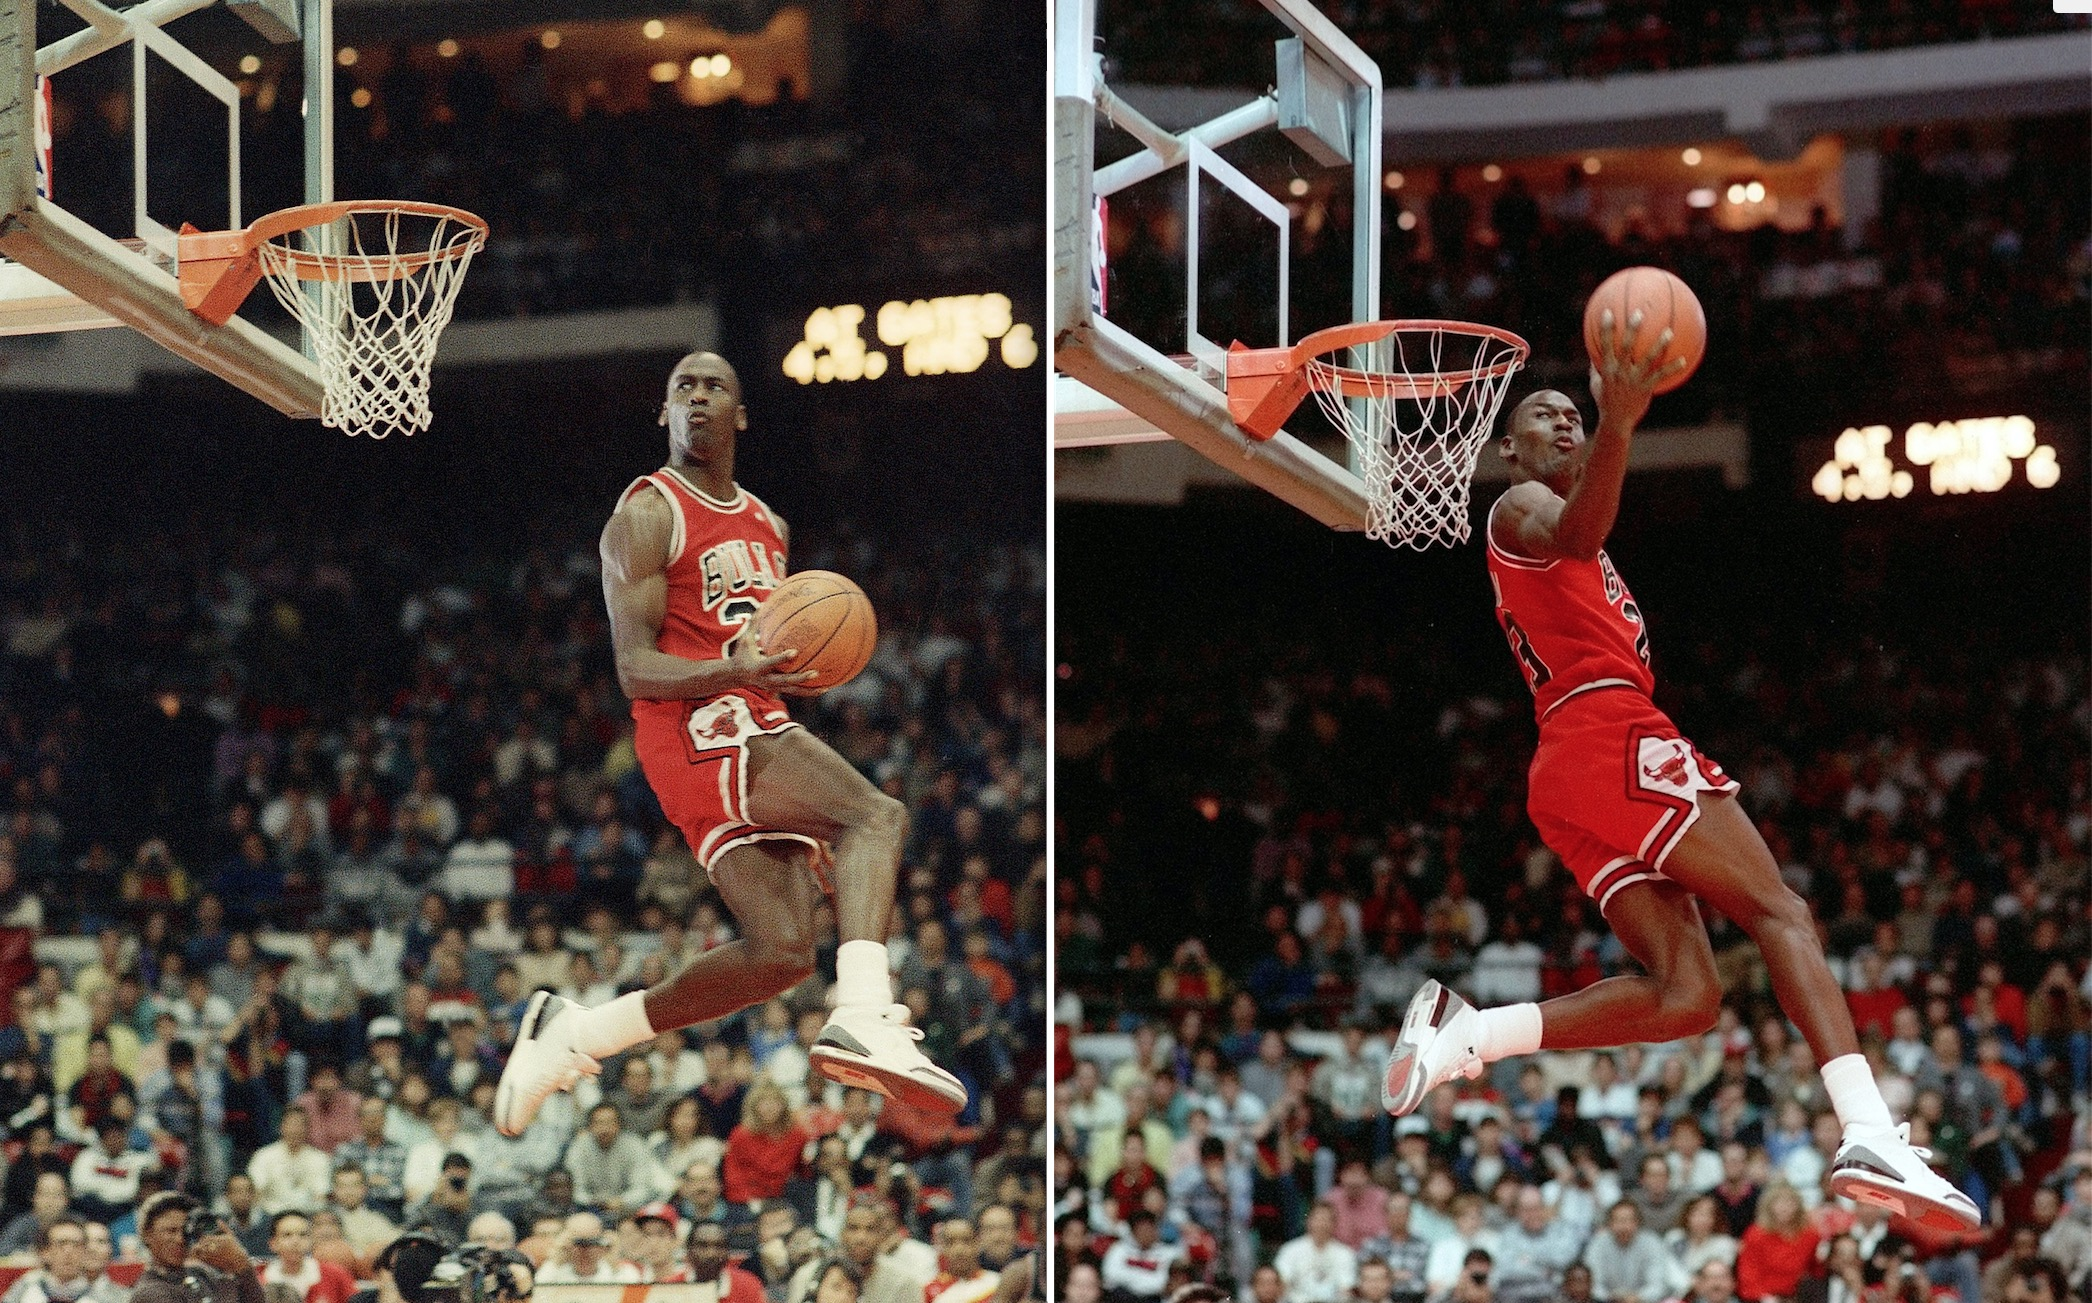 c04a4b086726 NBA Fan Gets Tattoo of Michael Jordan s Famous 1988 Free Throw Line Dunk